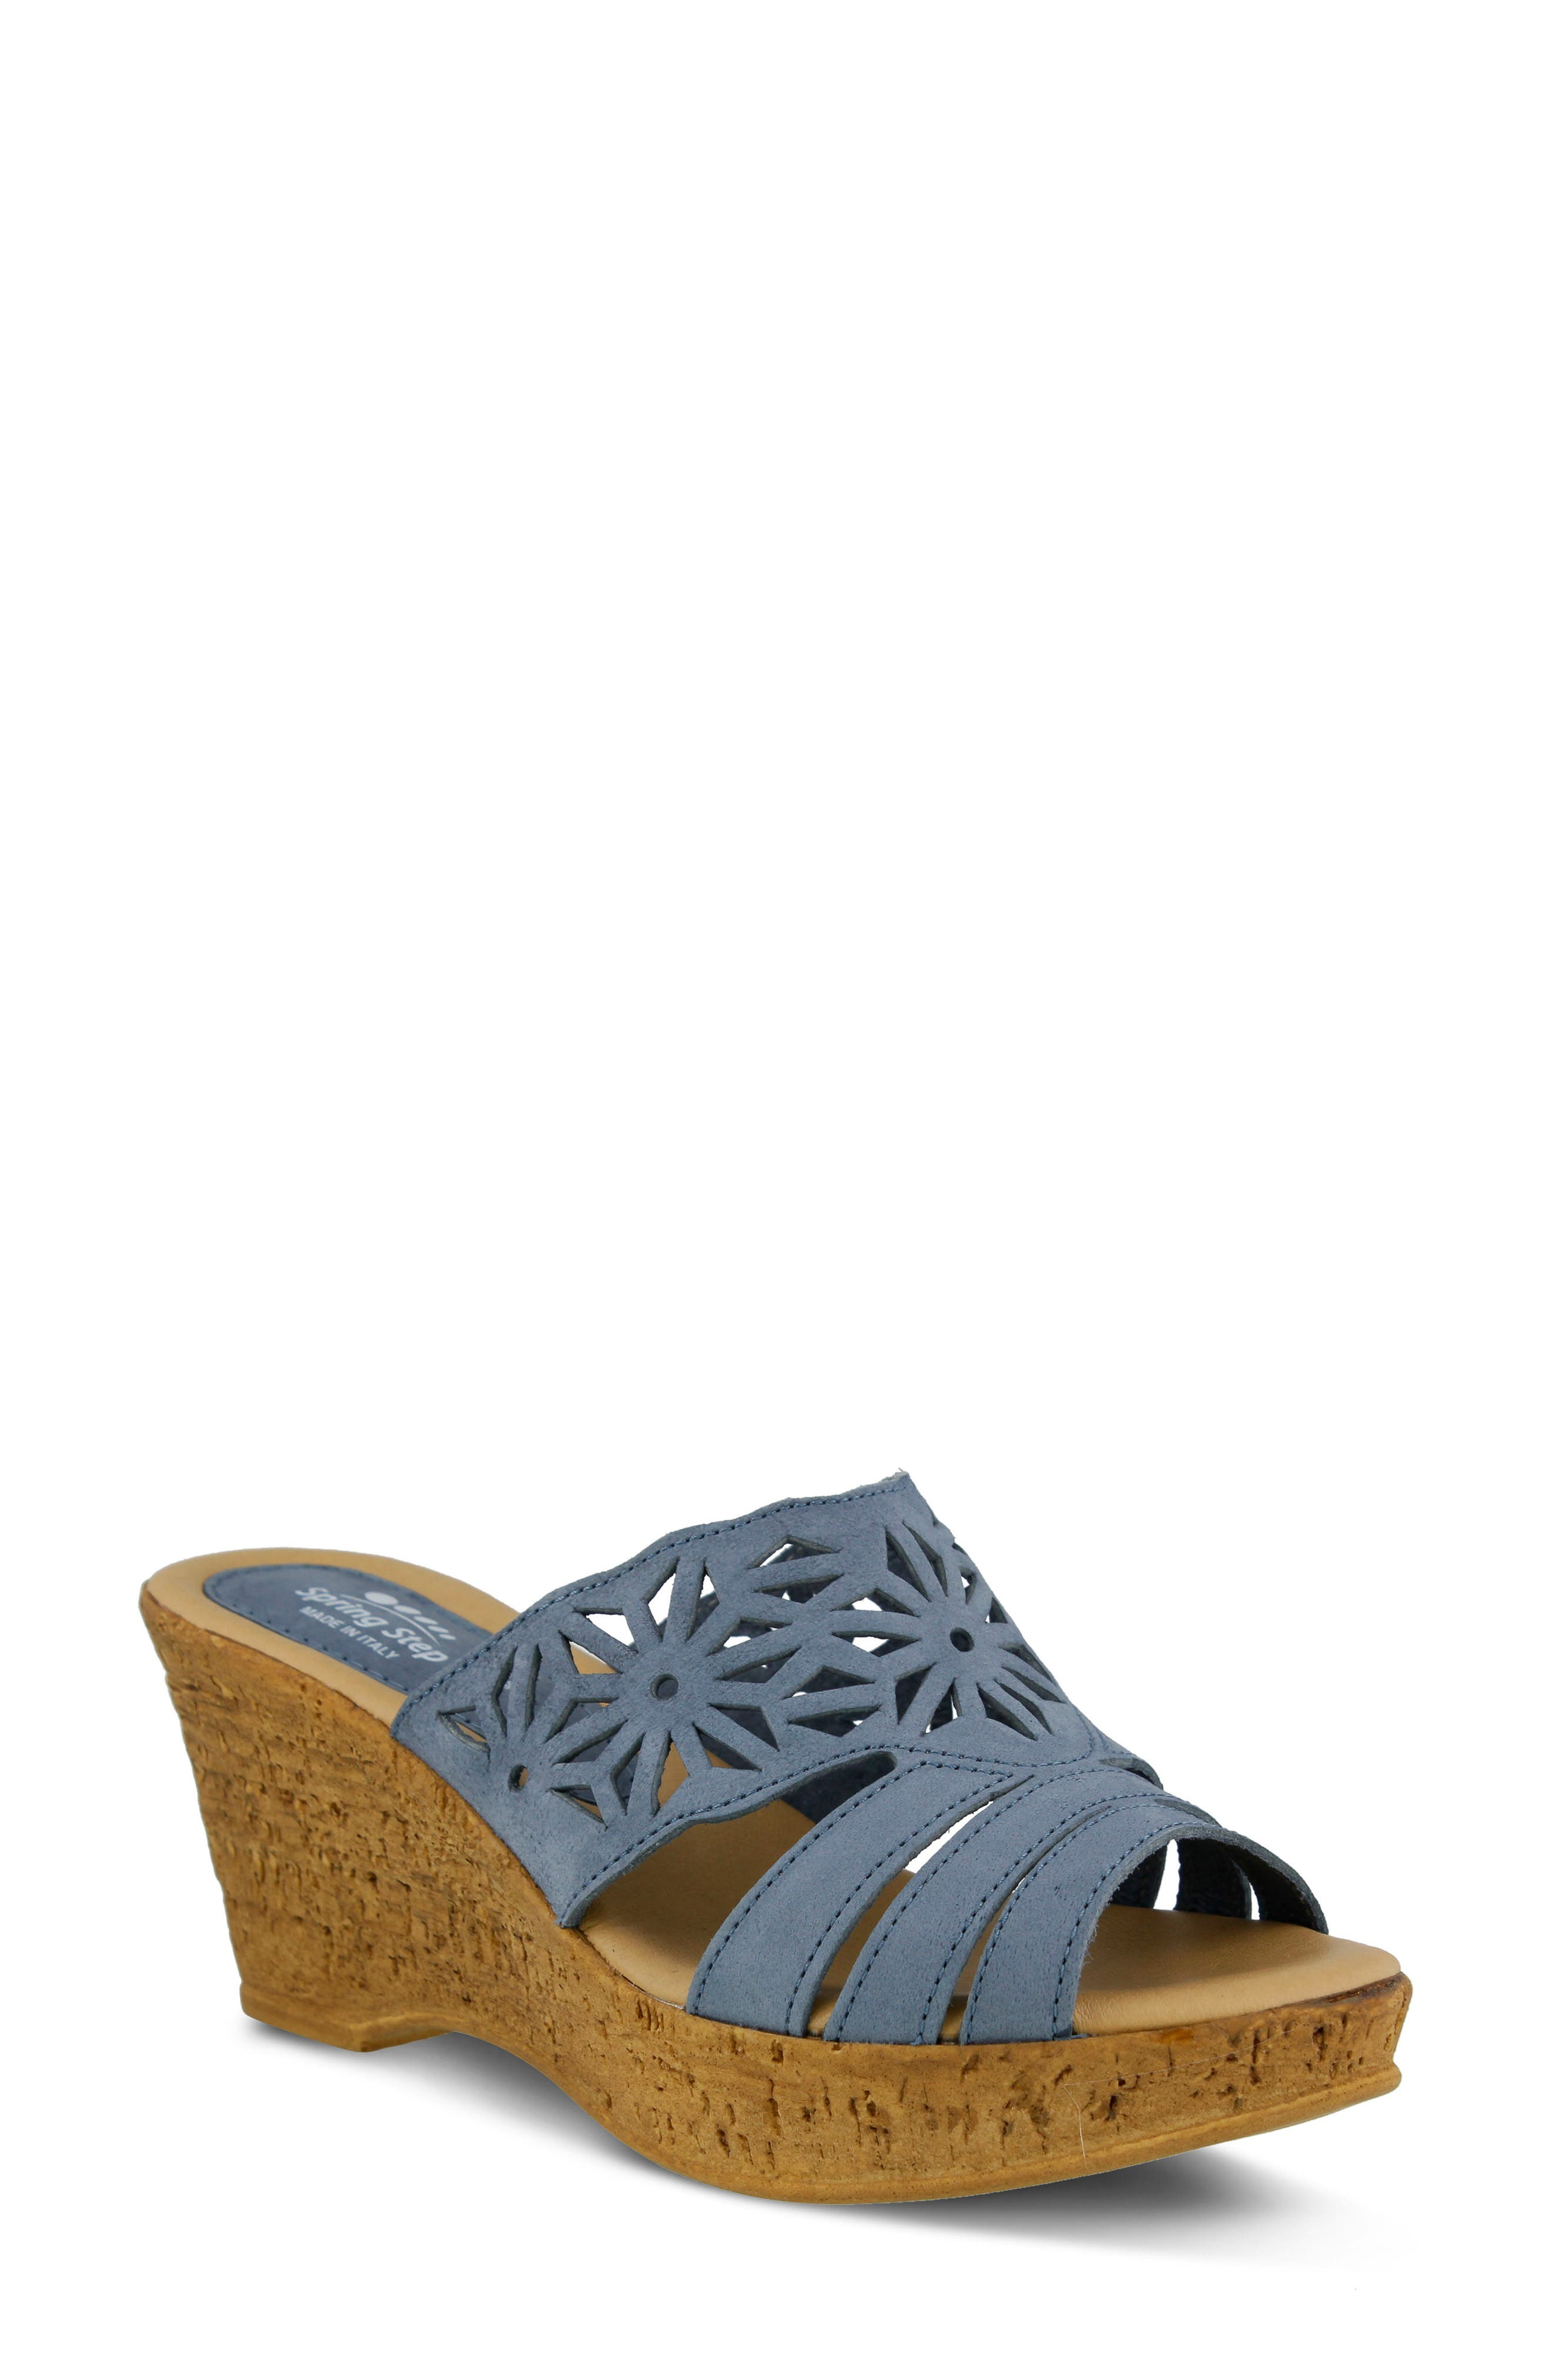 Dora Wedge Sandal,                             Main thumbnail 1, color,                             Blue Nubuck